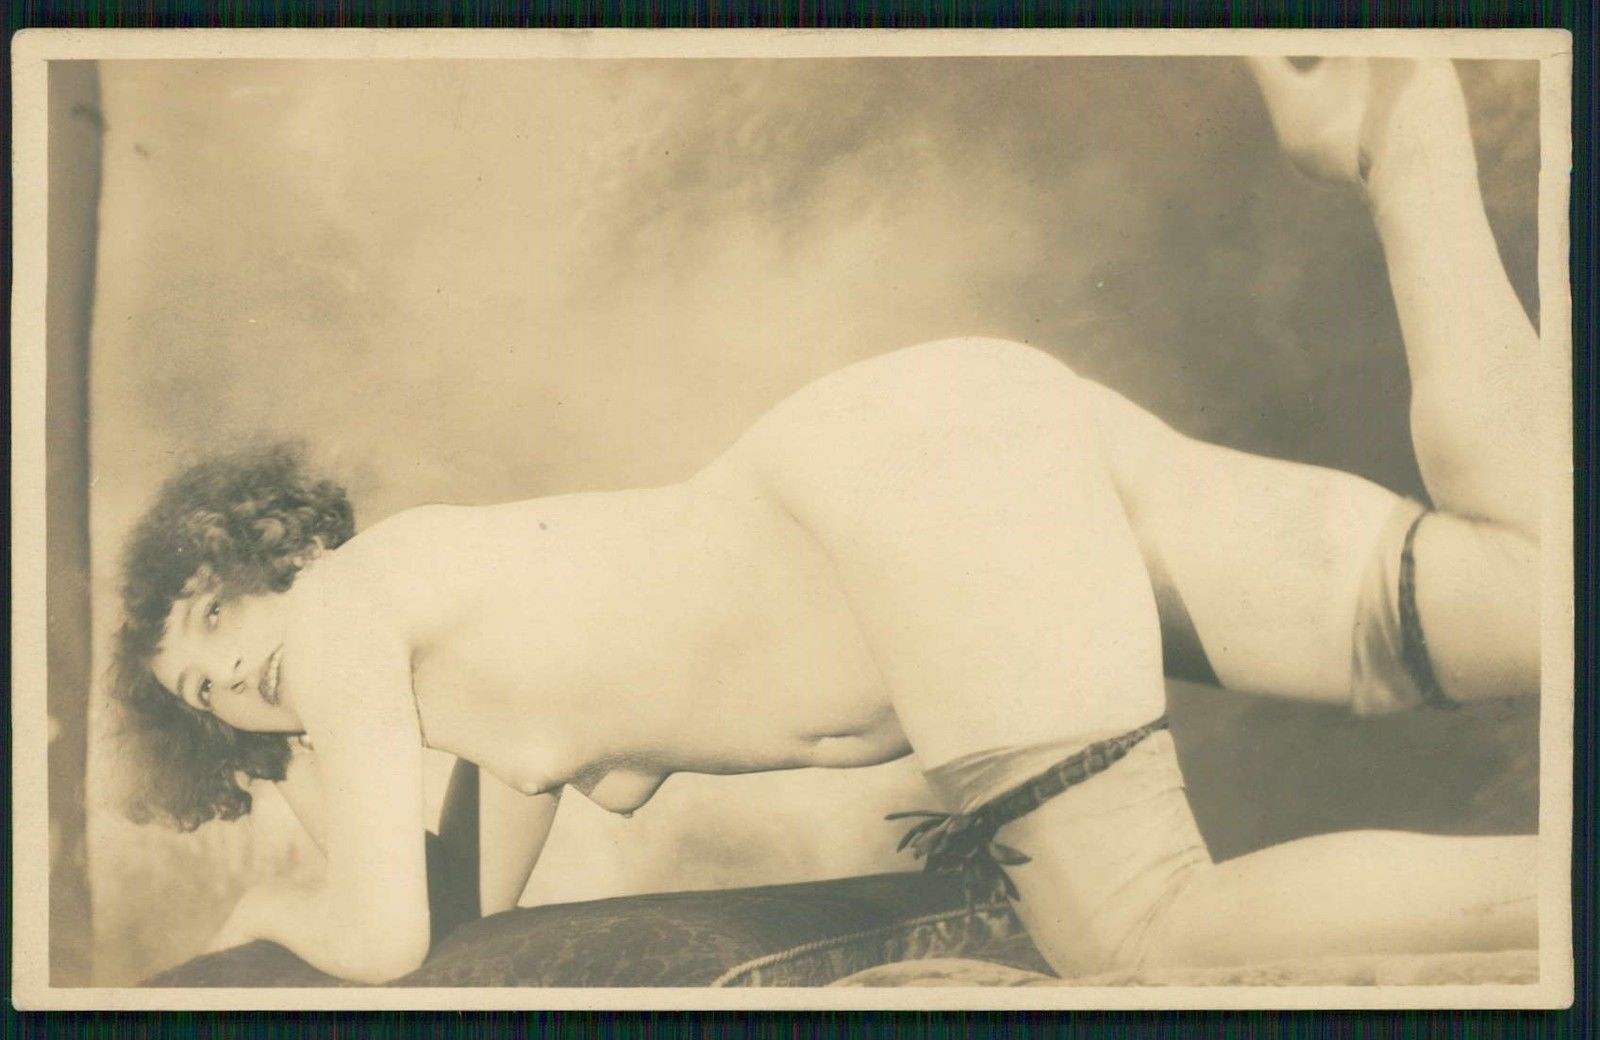 Grundworth - Femme nue, 1920s Gelatin silver medium postcard